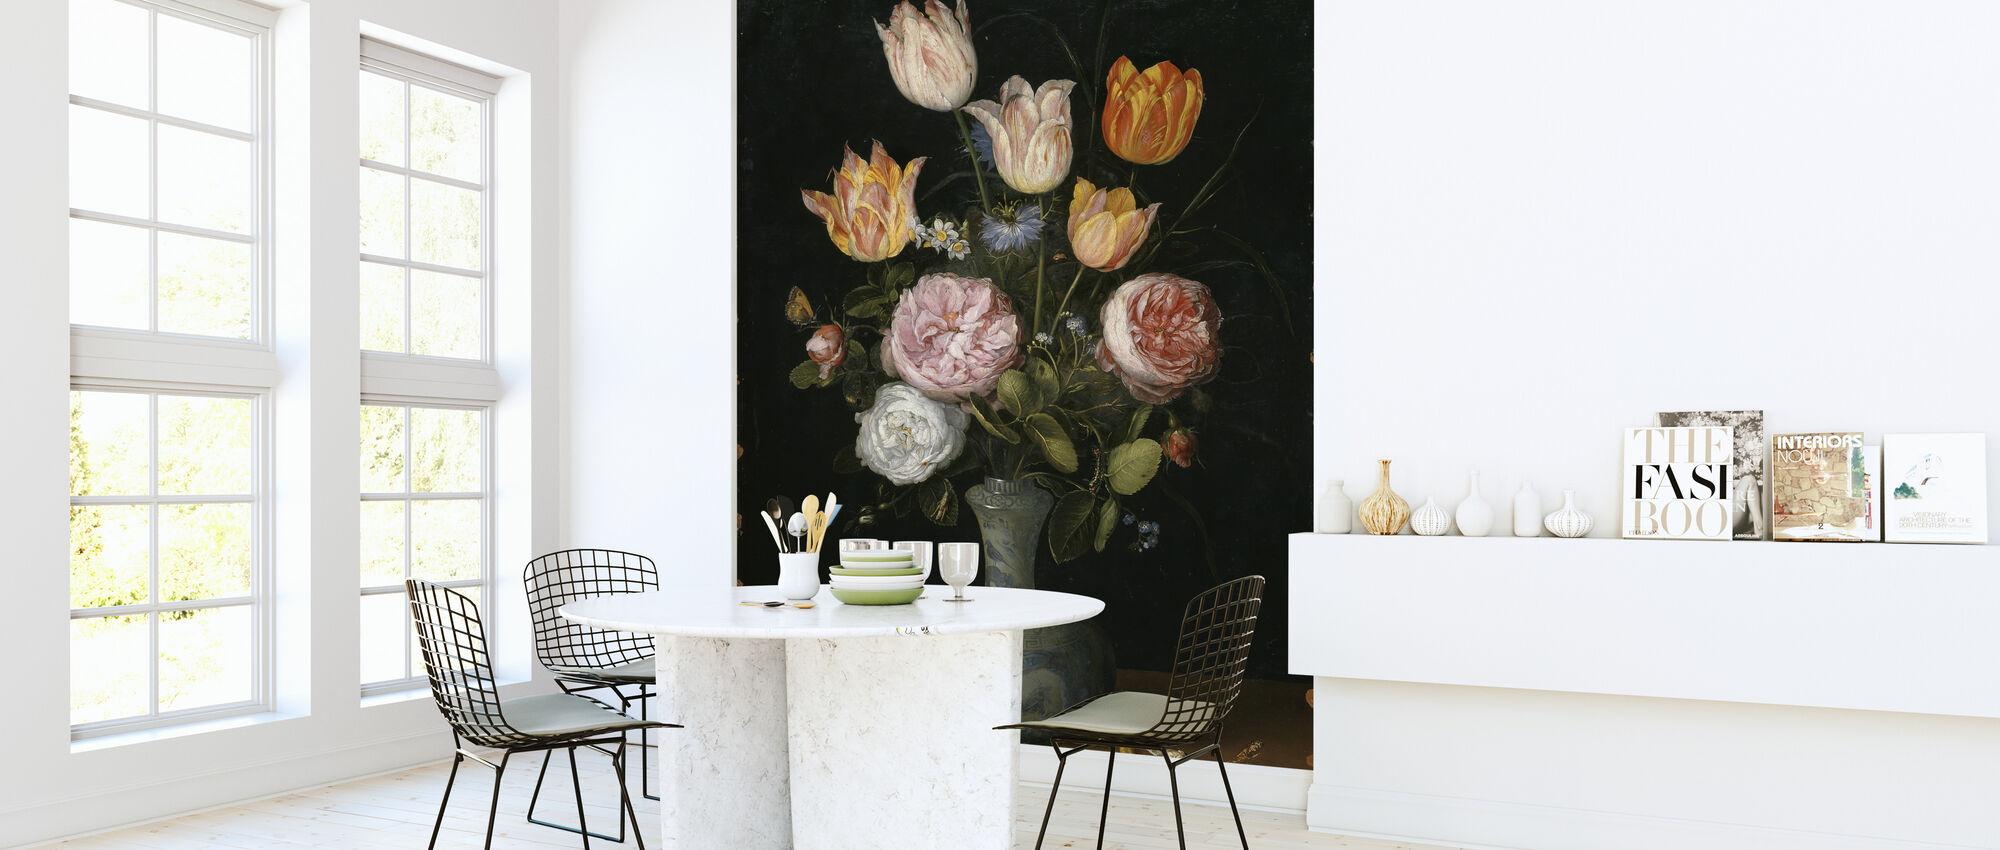 Vase of Flowers - Jan Brueghel - Wallpaper - Kitchen